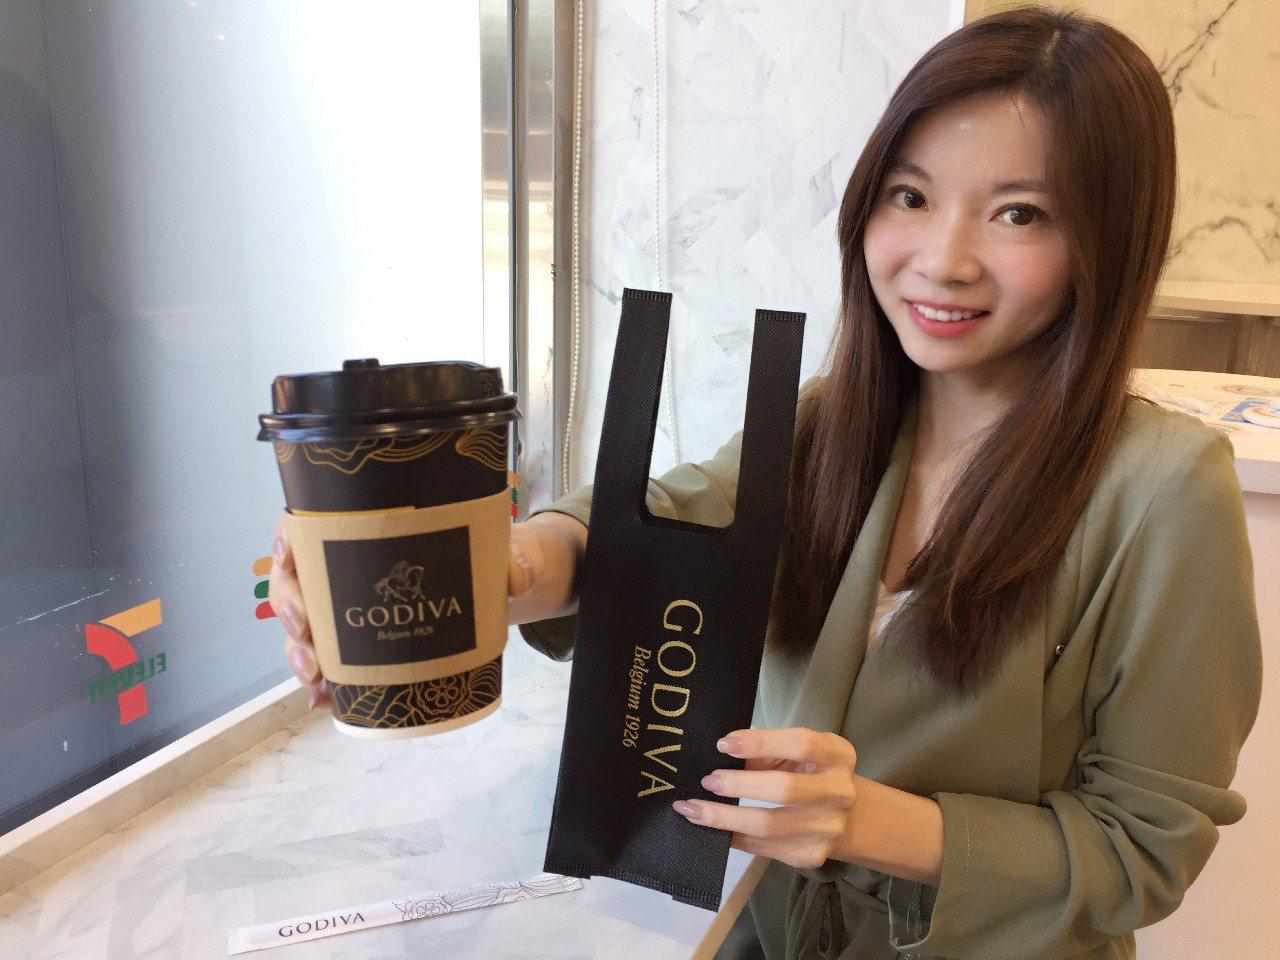 GODIVA醇黑熱巧克力今年還隨杯附上特製專用織布環保袋。圖/7-ELEVEN提...